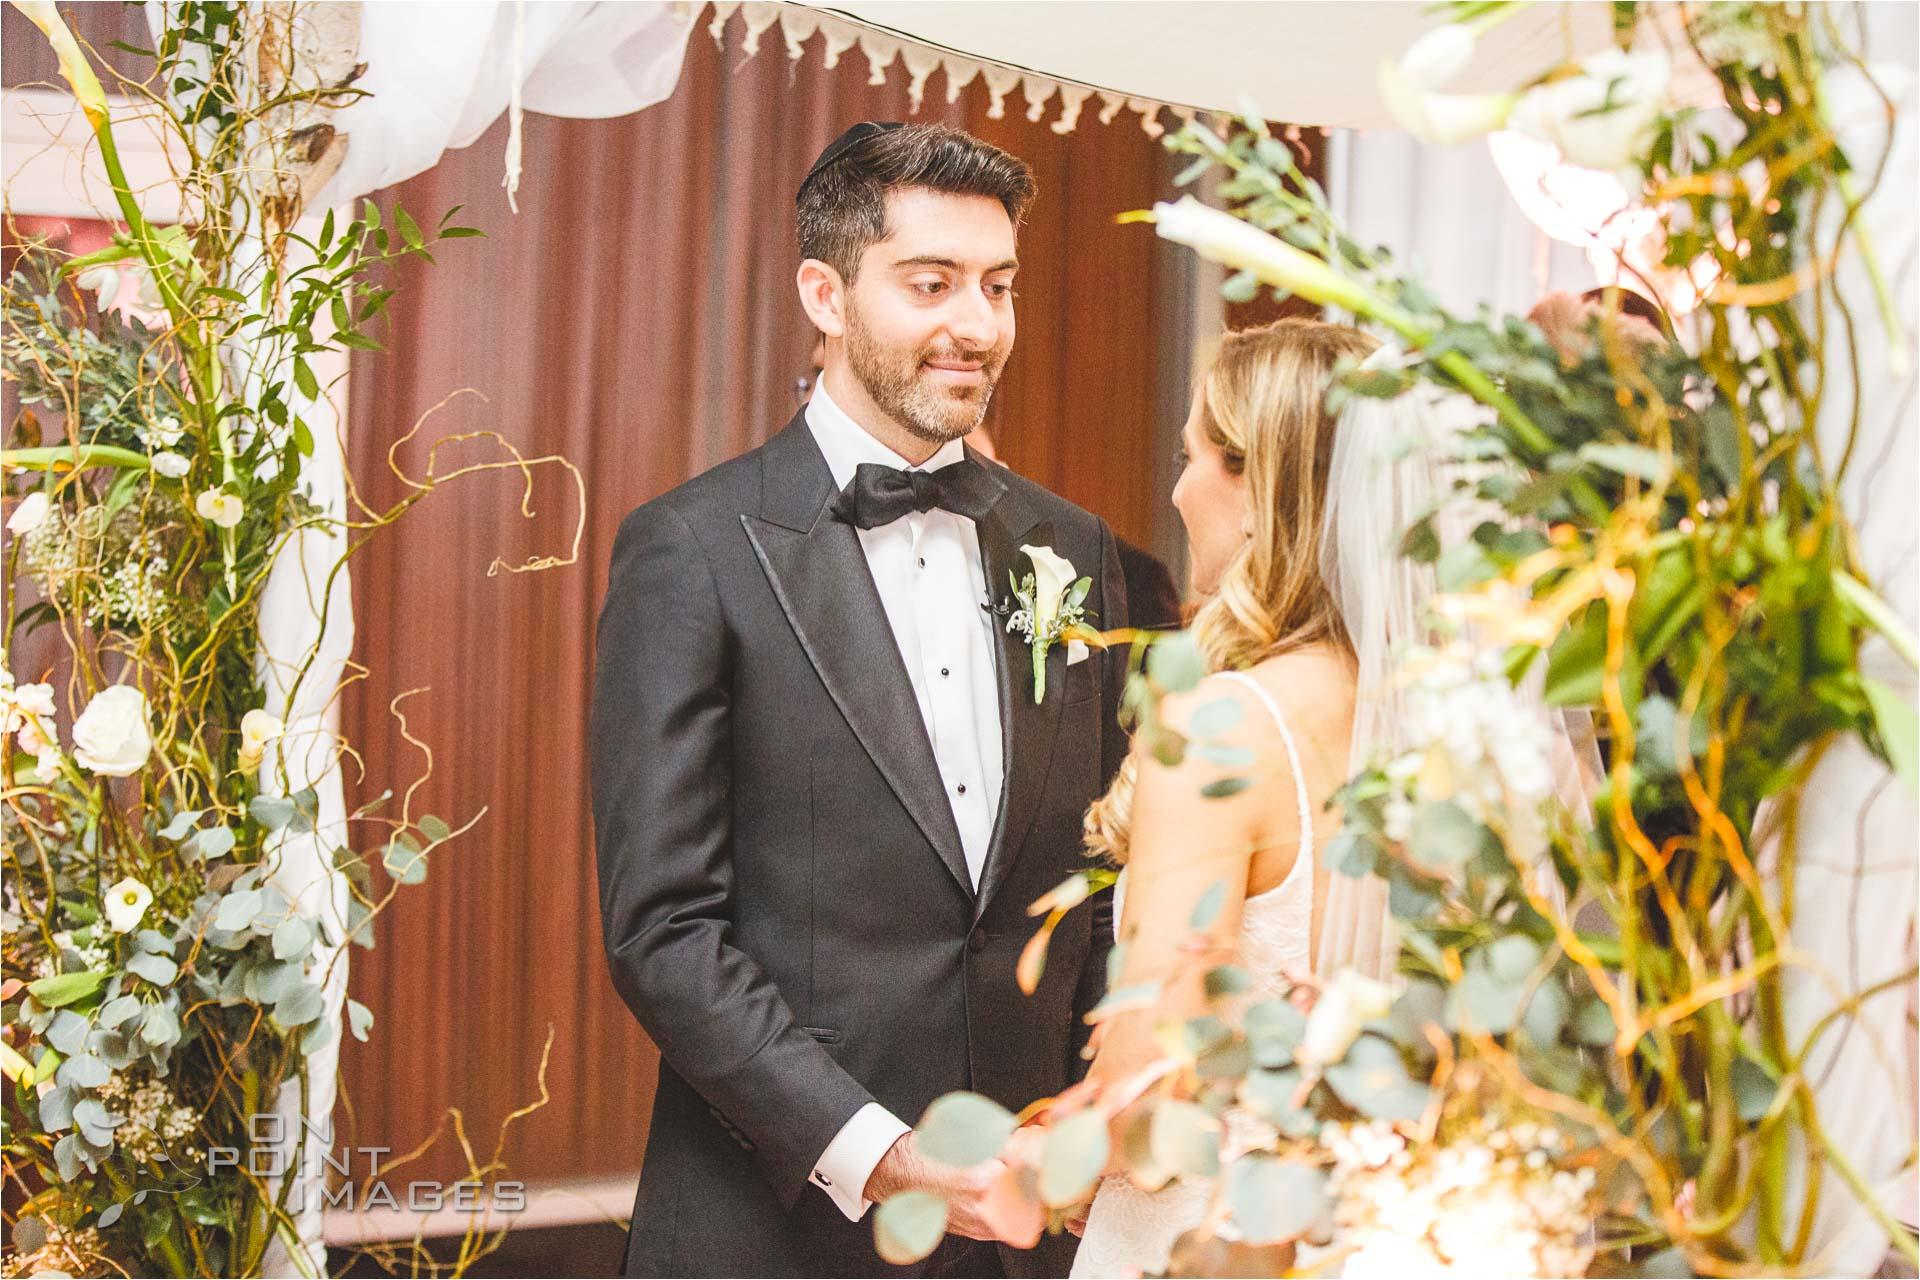 marquee-events-wedding-hartford-ct-29.jpg